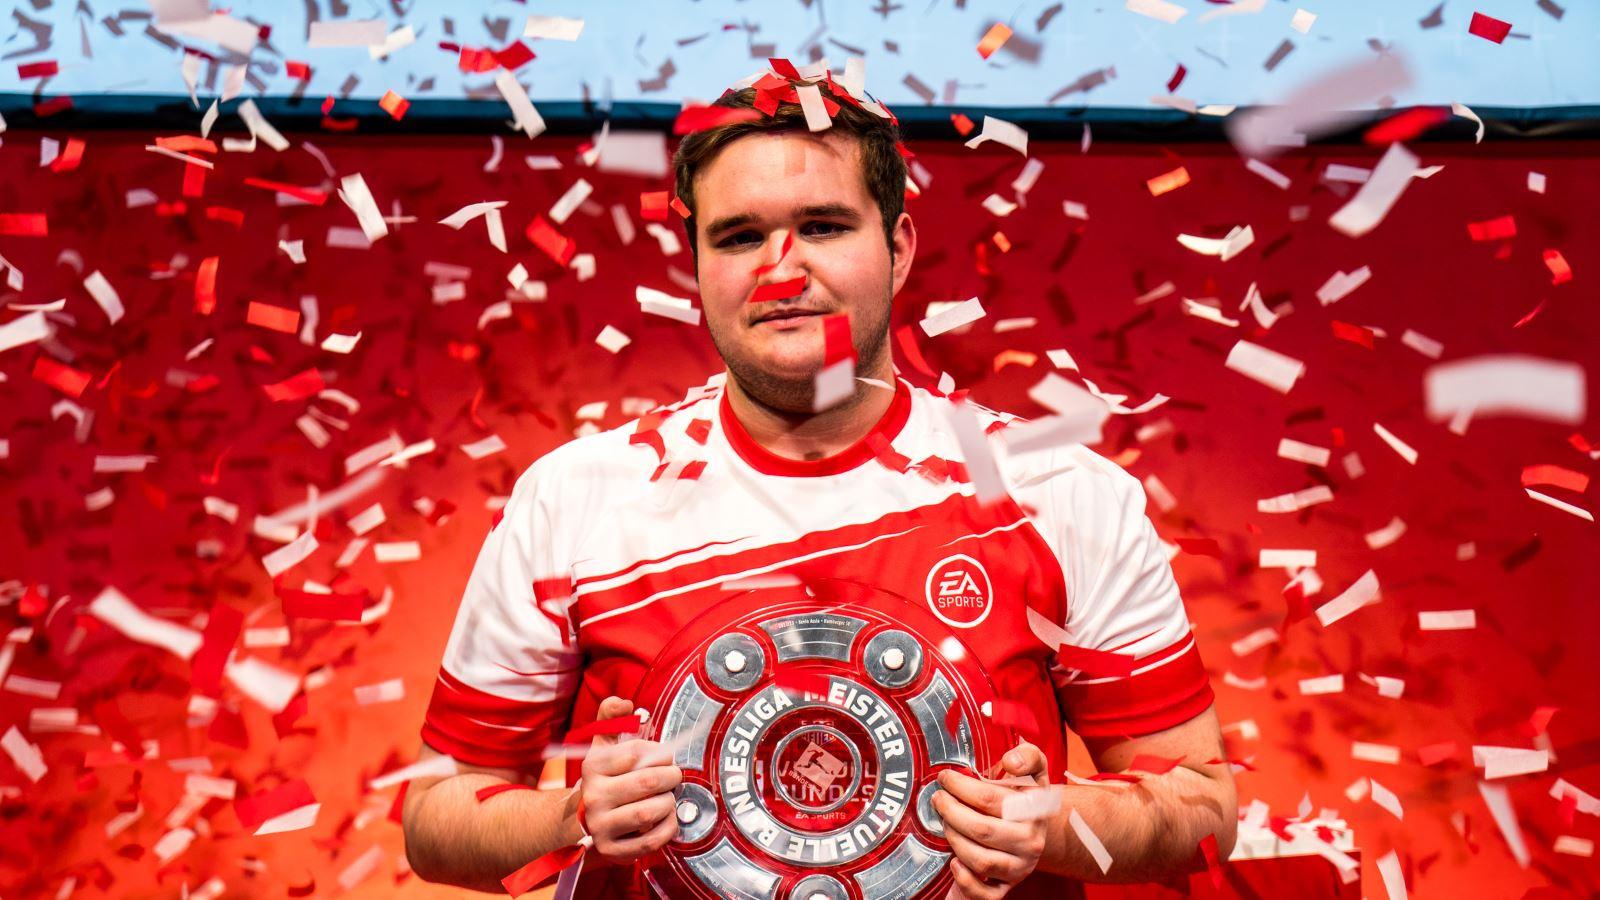 Profi gewinnt Bundesliga in FIFA 18 mit starkem Pressing – So geht's